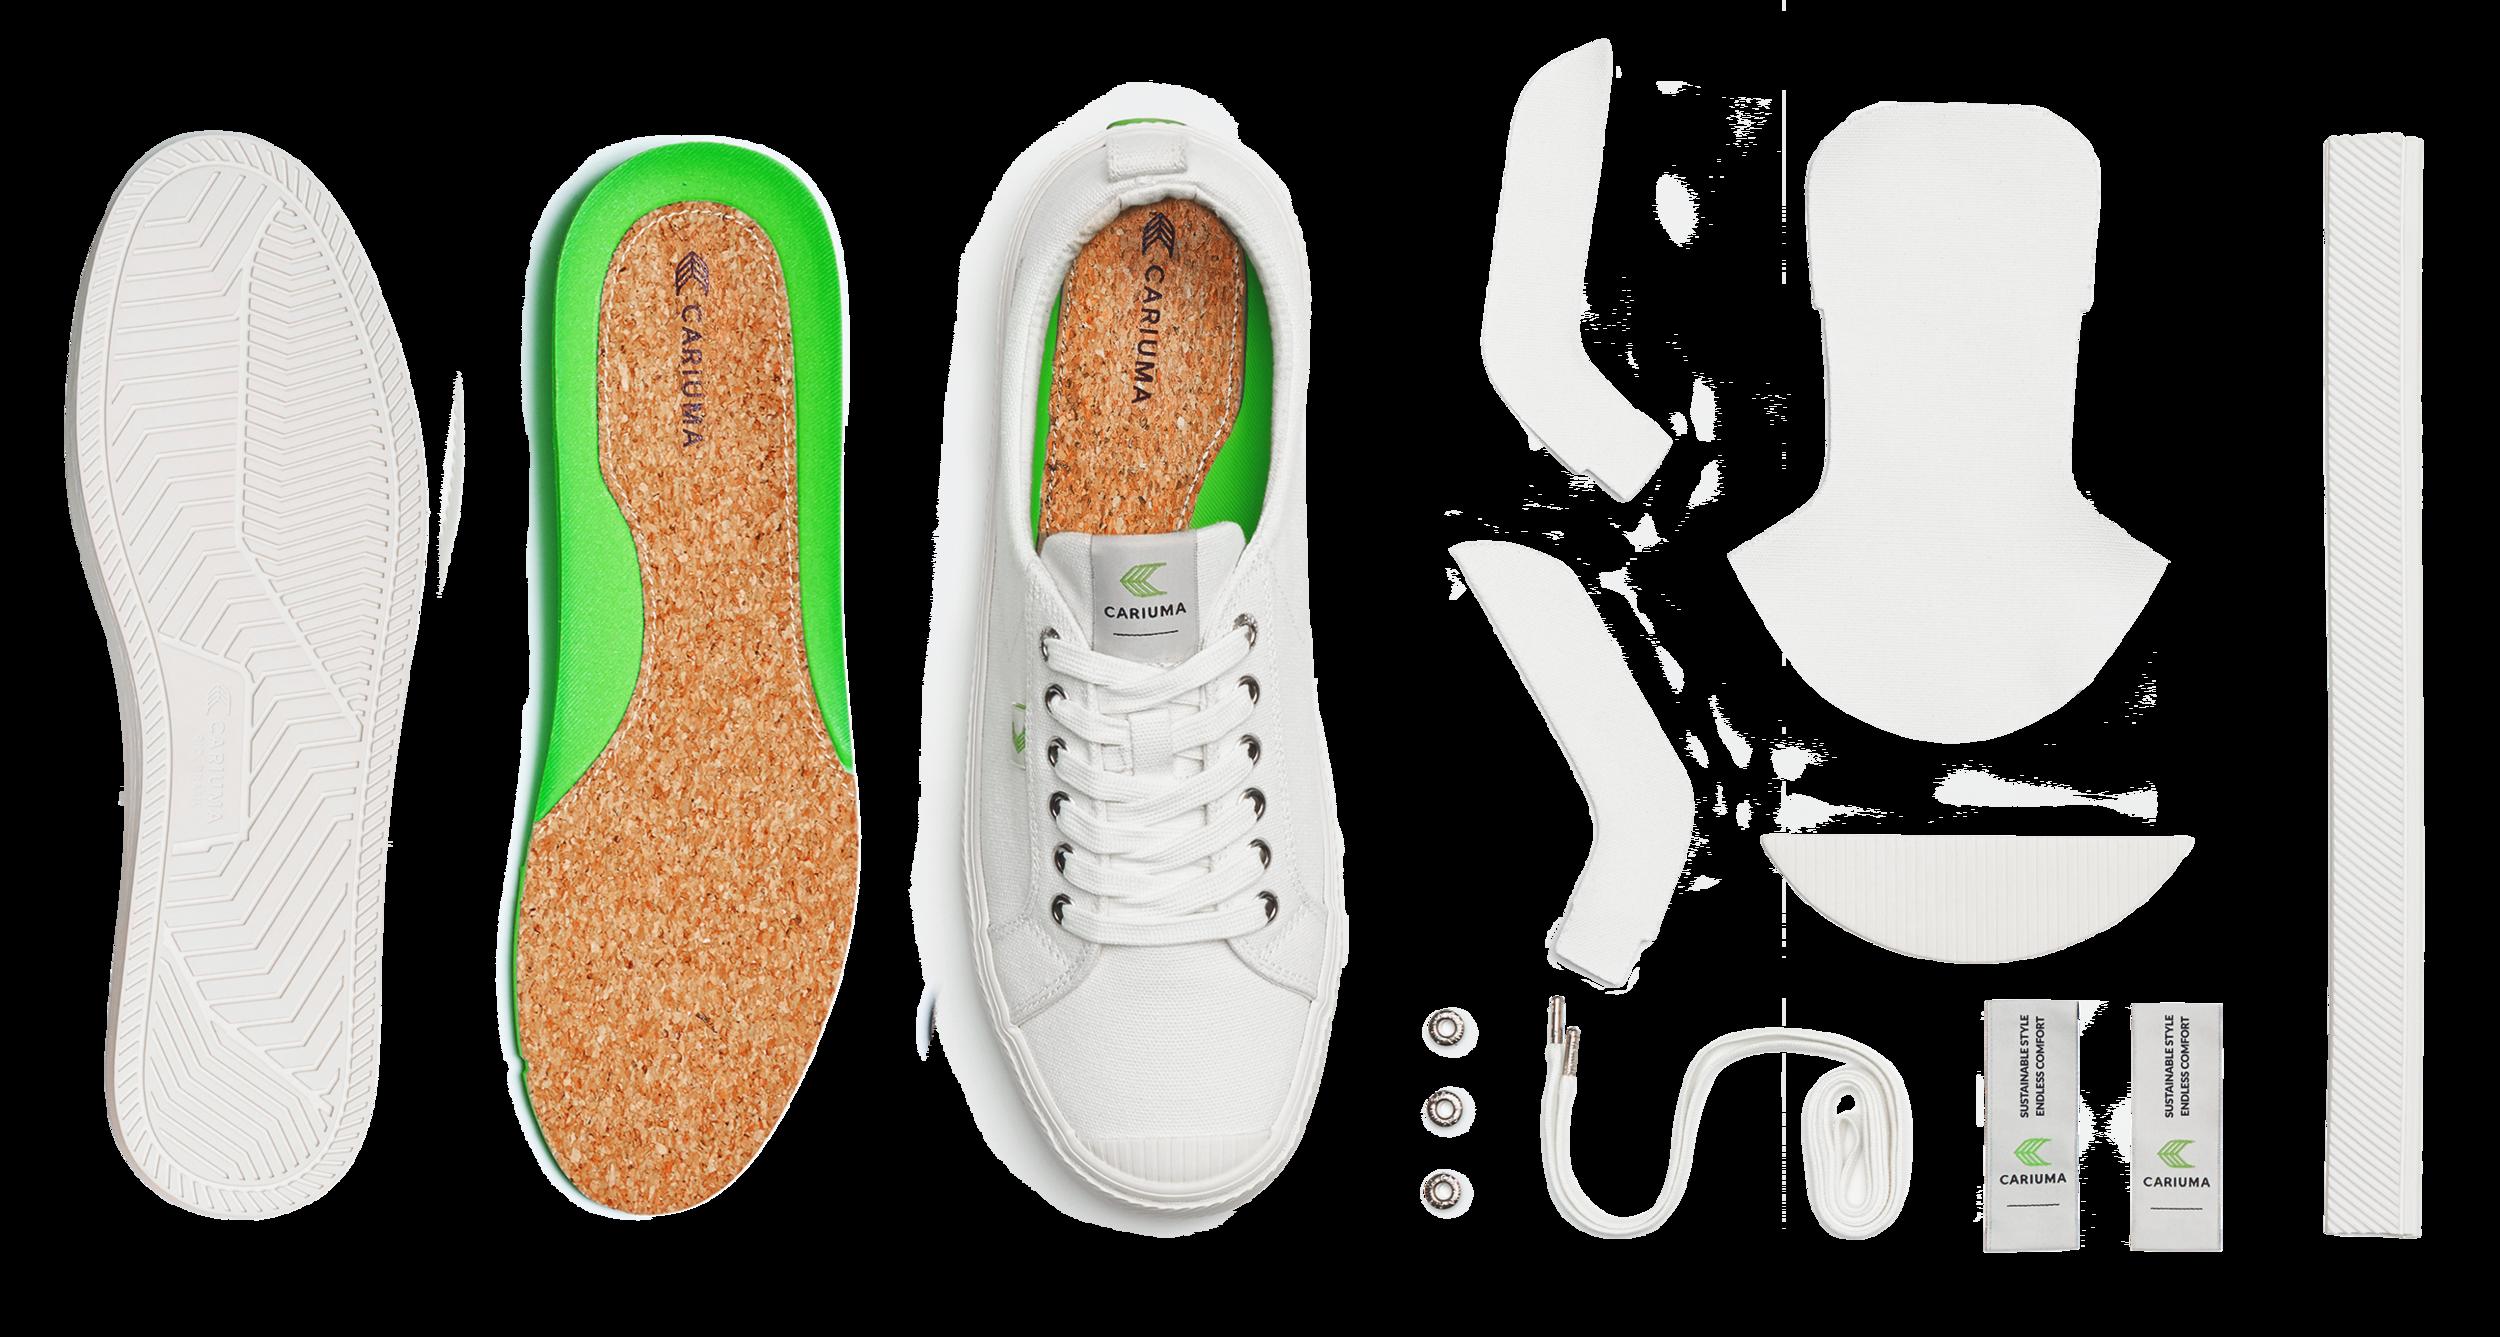 Components of Cariuma OCA Low shoe spread out